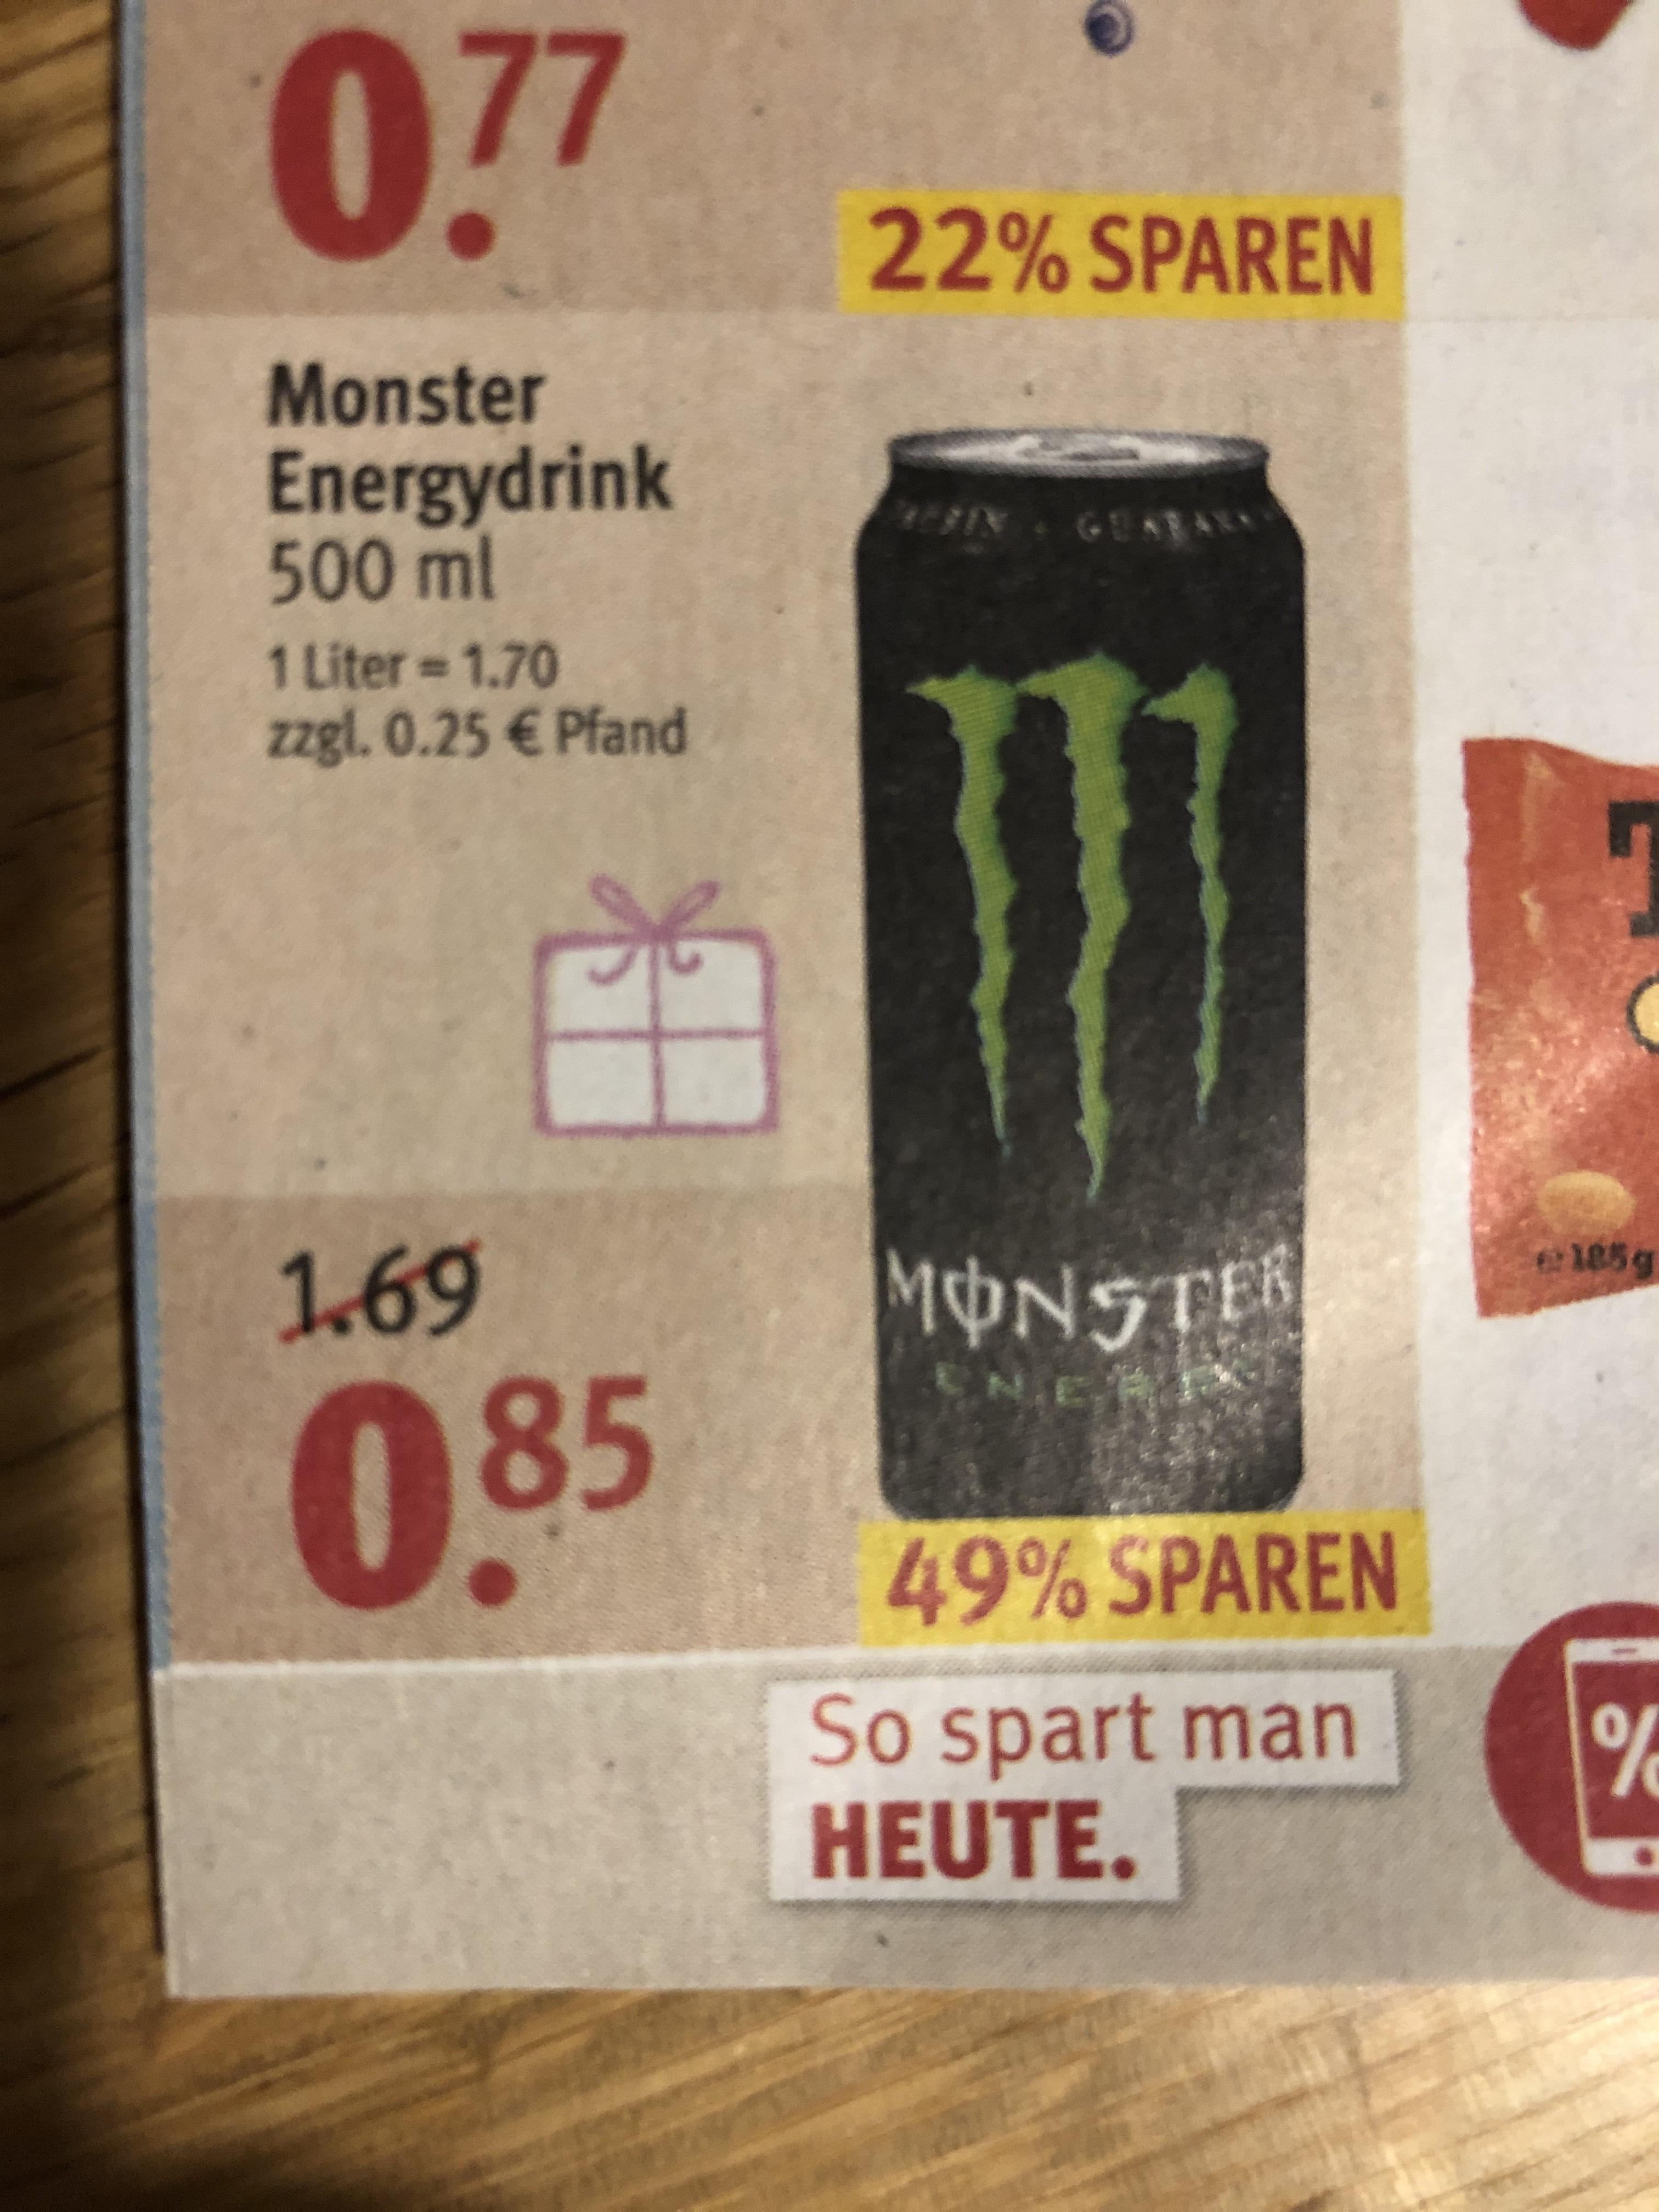 [rossmann] Monster Energy für 85 Cent -10% App Coupon